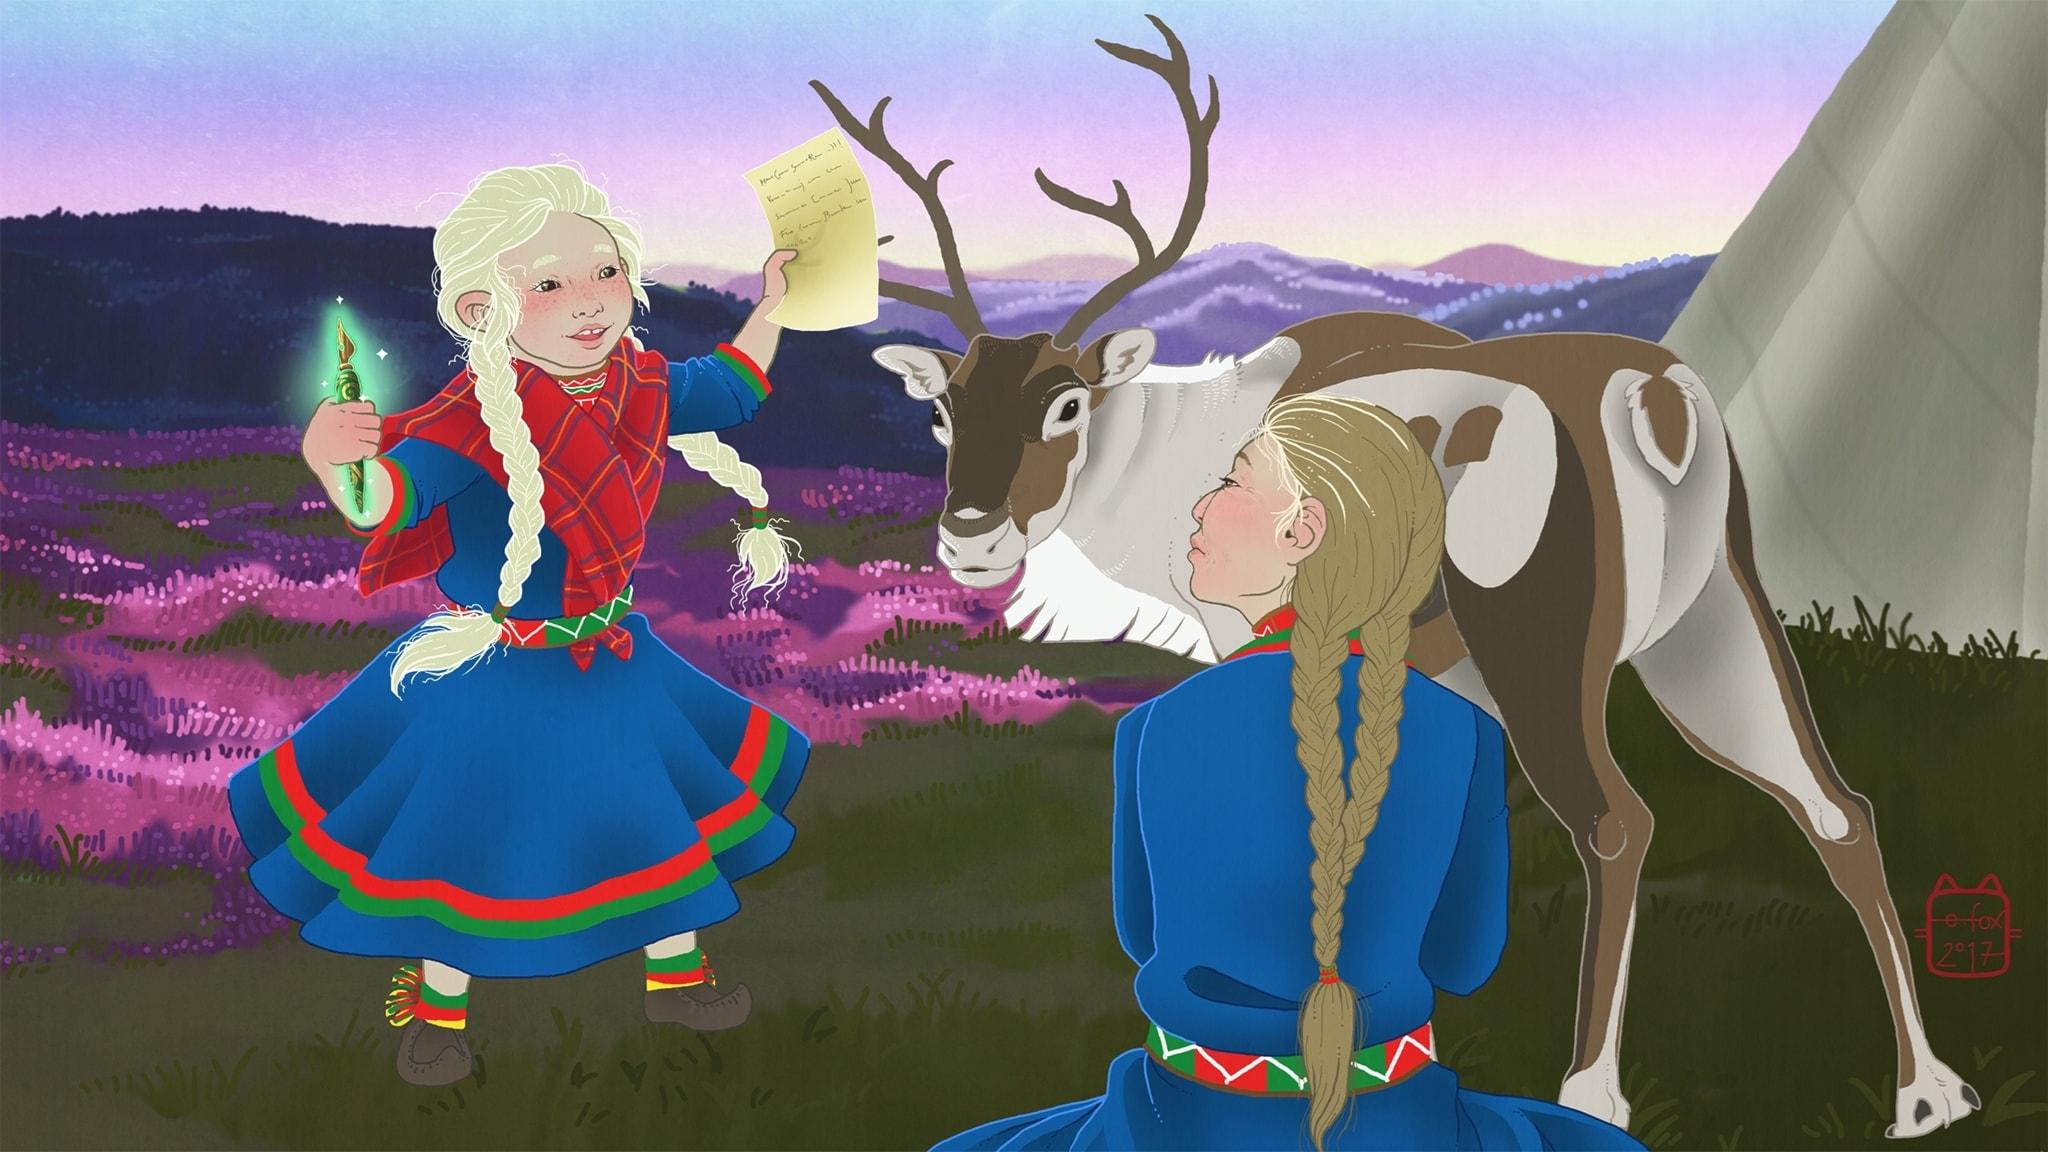 Elsa Sáivu-gonagasa máilmmis, 4. oassi: Girji